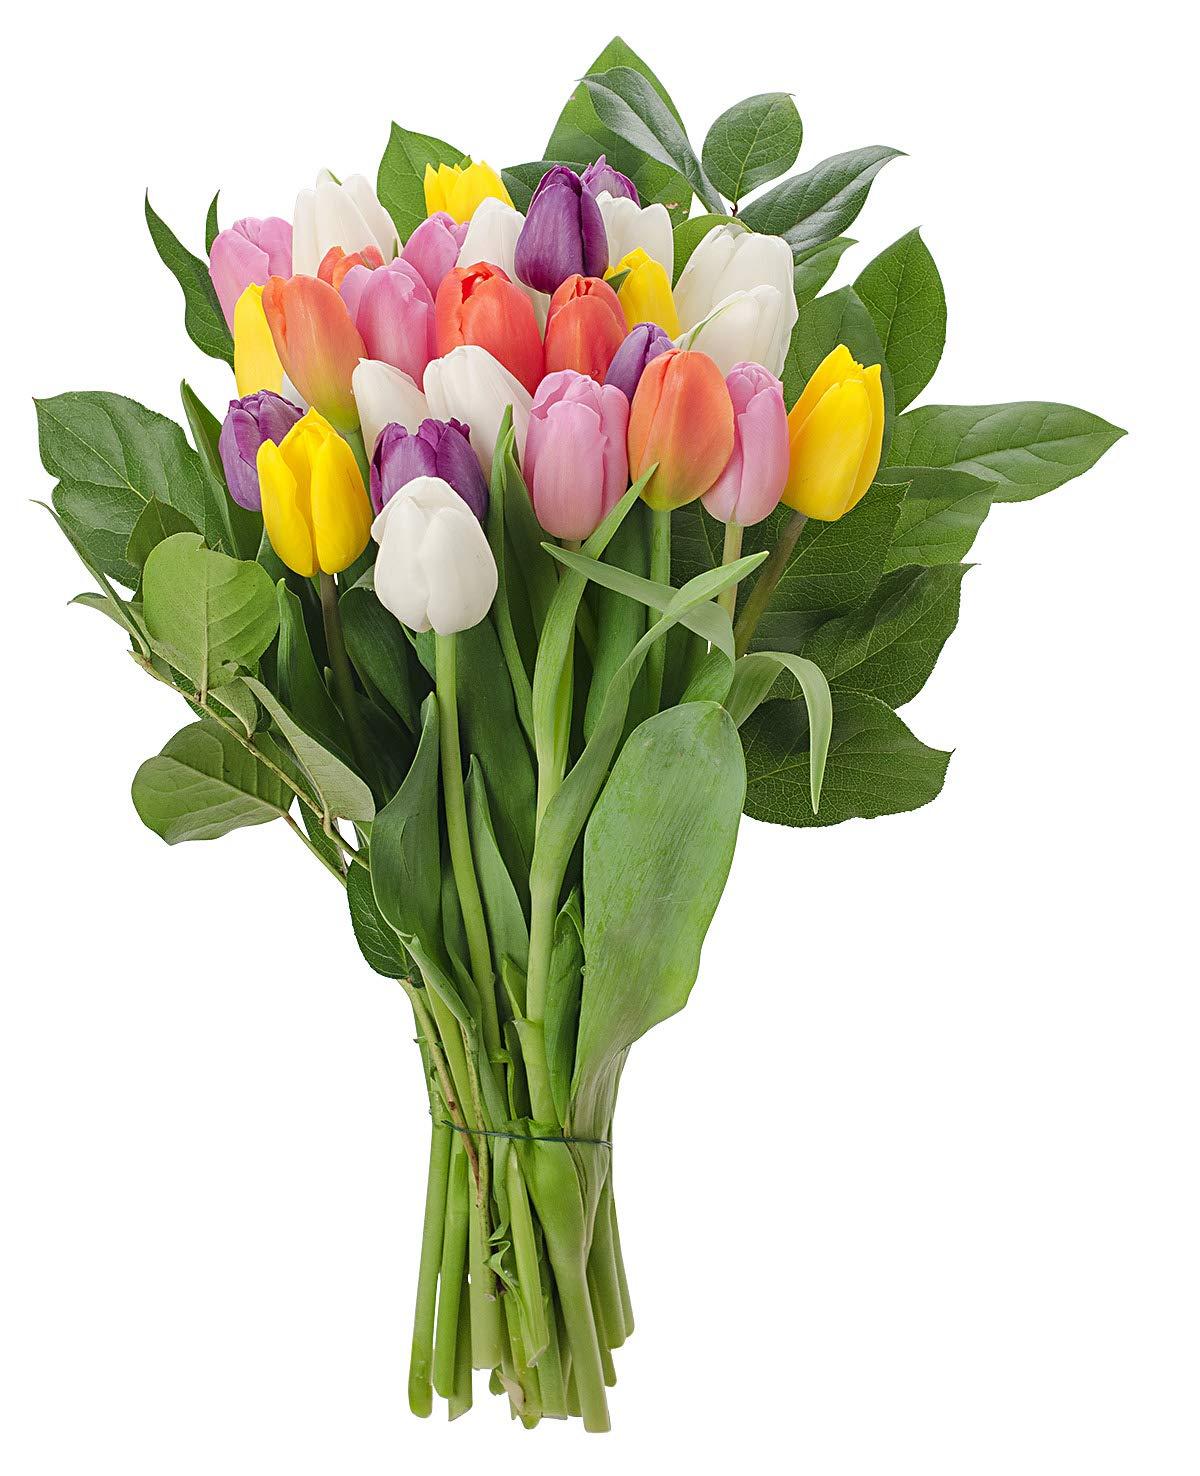 Stargazer Barn Rainbow Bouquet Stems Of Fresh Tulips No Vase, 30 Stems by Stargazer Barn